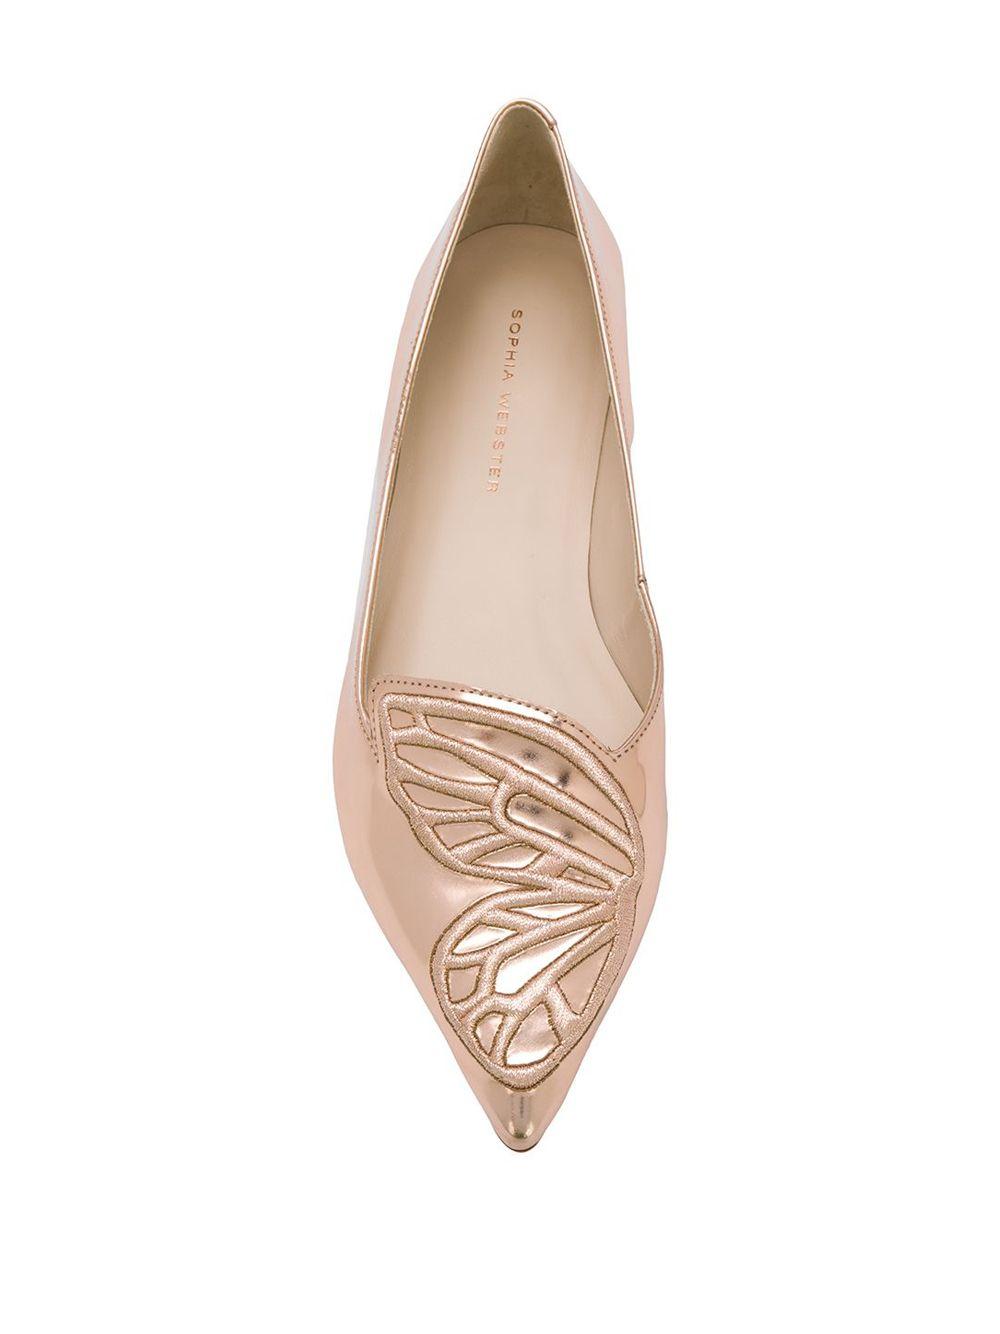 SOPHIA WEBSTER   балетки 'Bibi' с декором в виде бабочки   Clouty